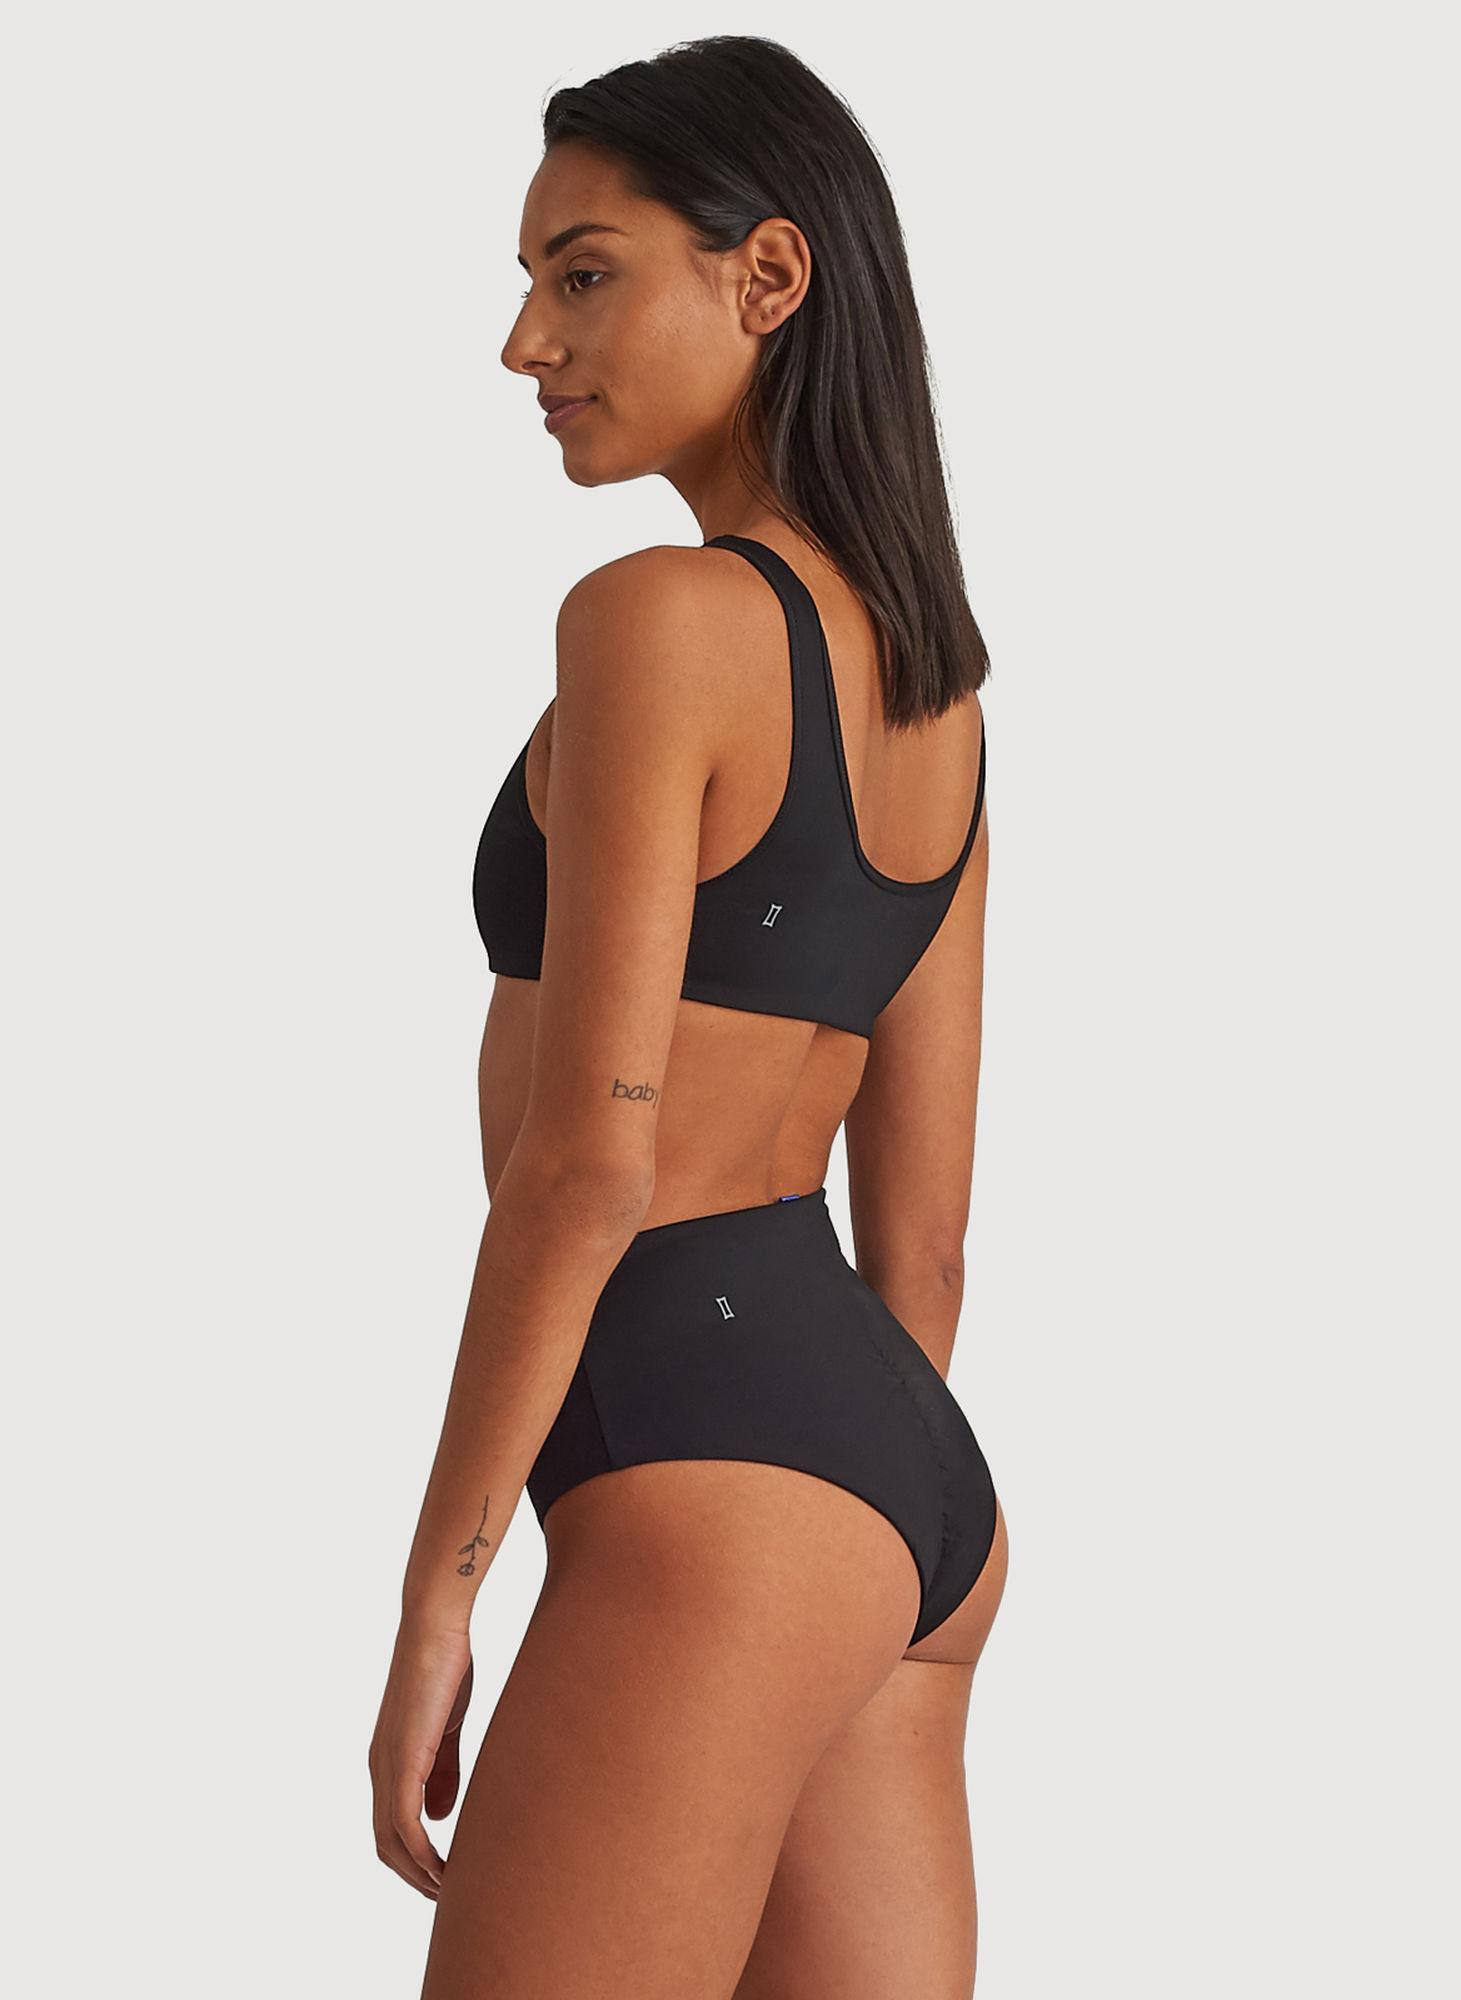 3a16d7d4b25 Kit and Ace - Black High Rise Cheeky Swim Bottom - Lyst. View fullscreen